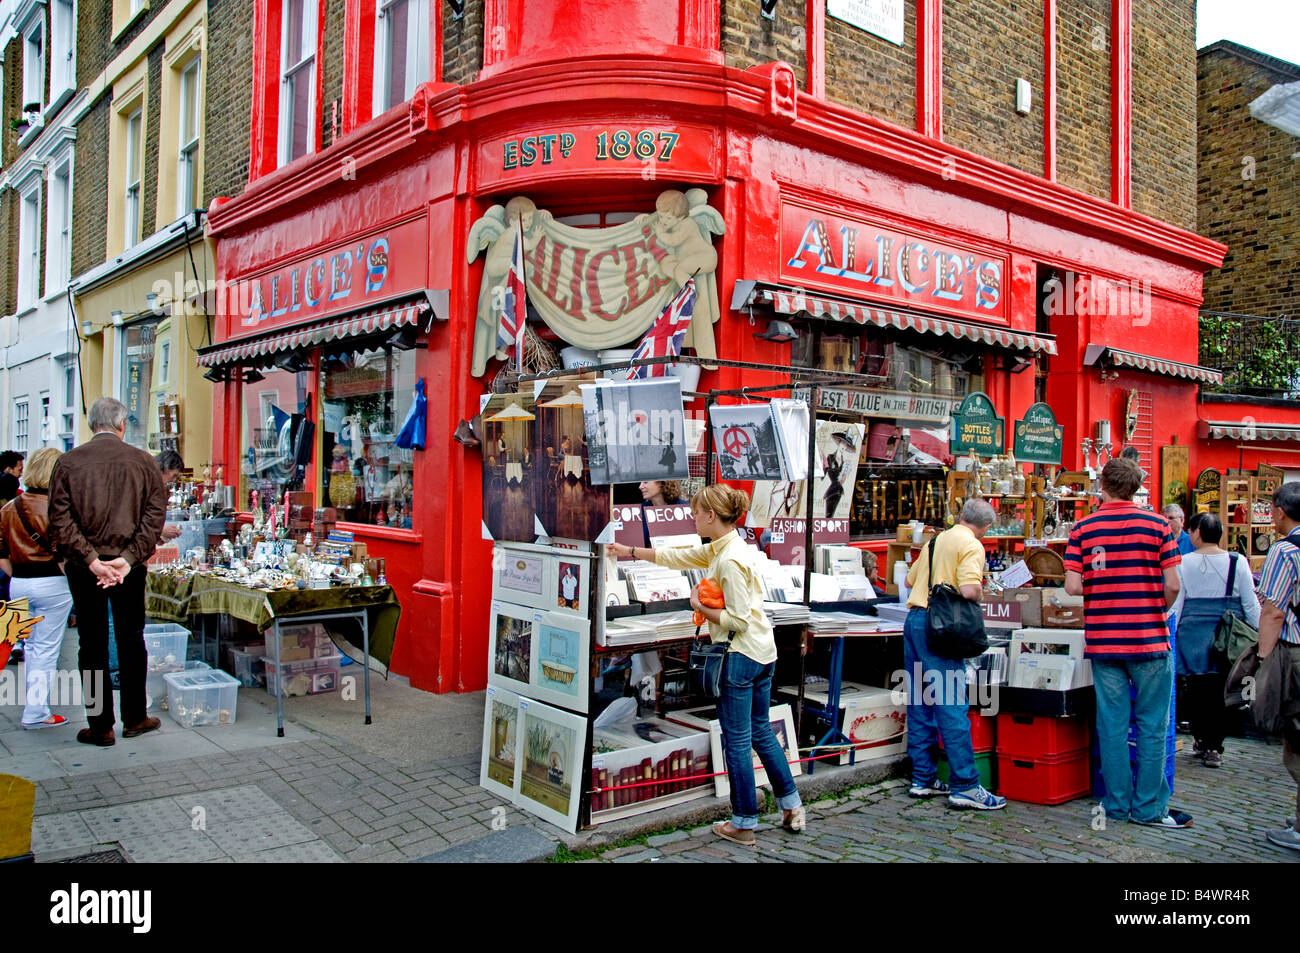 Mercado de antigüedades de Portobello Road de Londres Notting Hill. Foto de stock